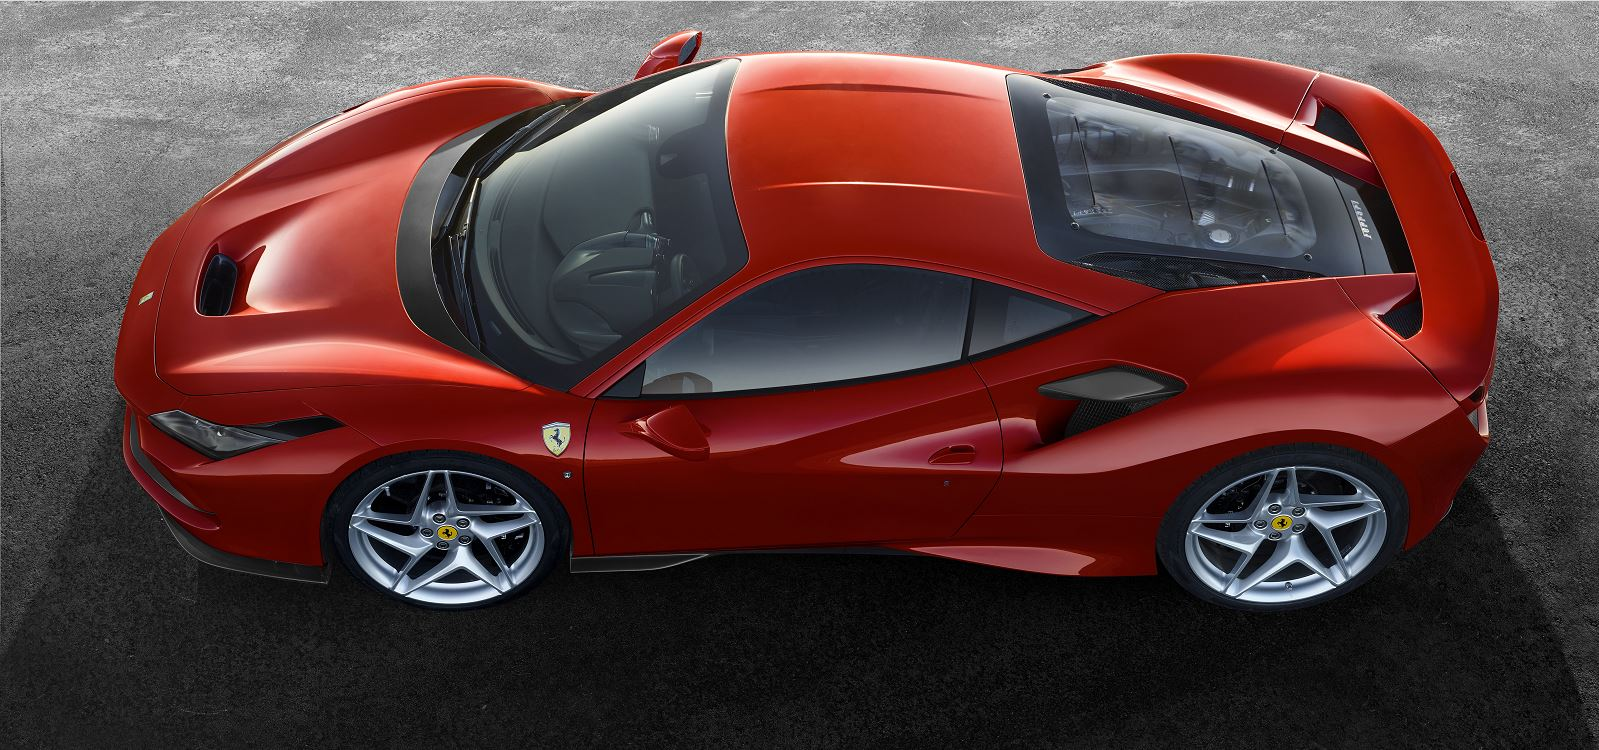 New Ferrari Cars For Sale Peoria And Phoenix Az Scottsdale Ferrari